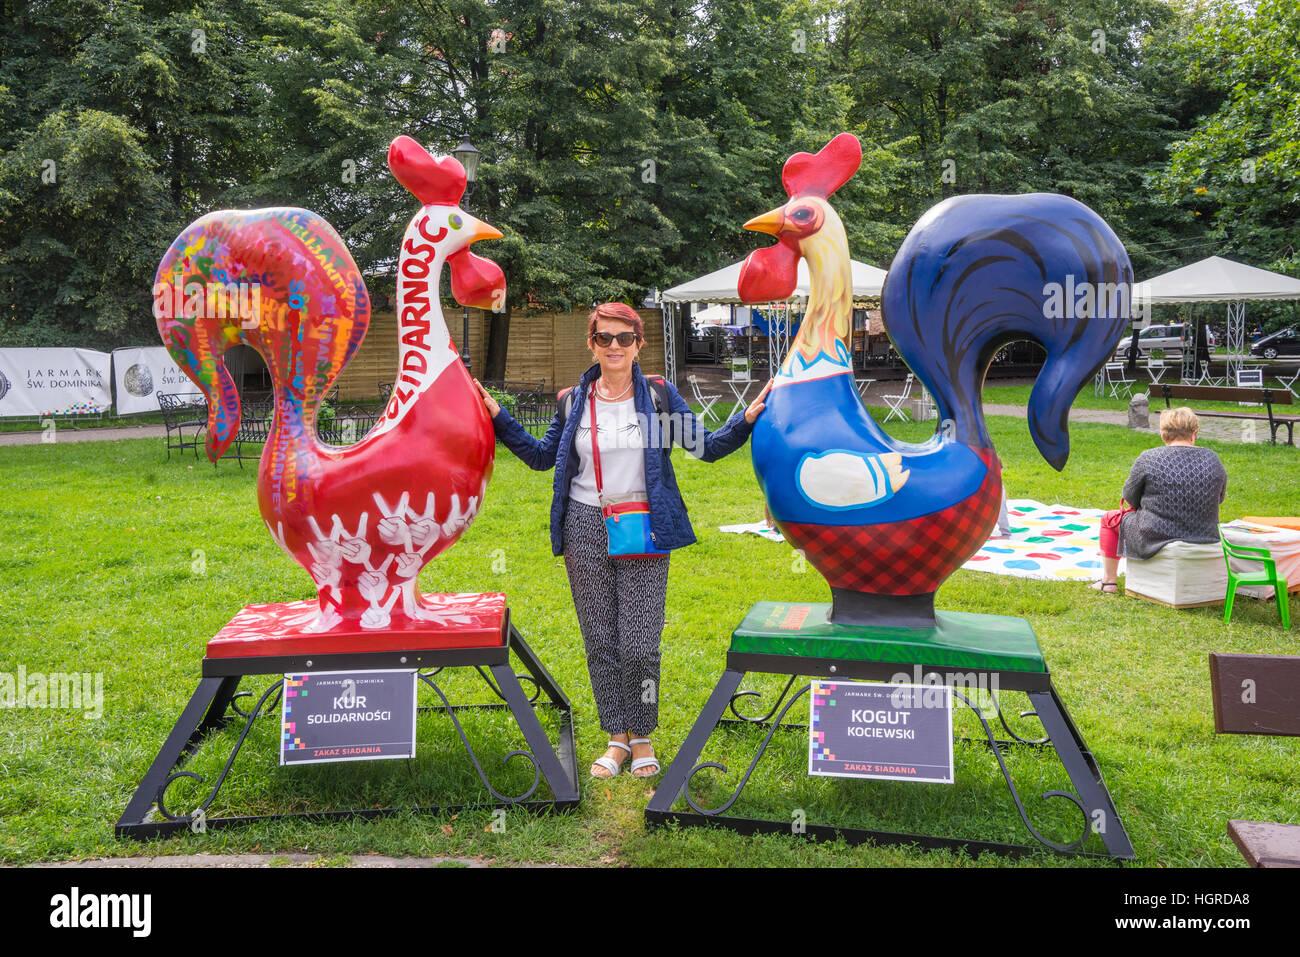 Polonia, Pomerania, Gdansk (Danzig), Gallo escultura exposición durante la anual Feria de San Dominico Kobzdej Imagen De Stock